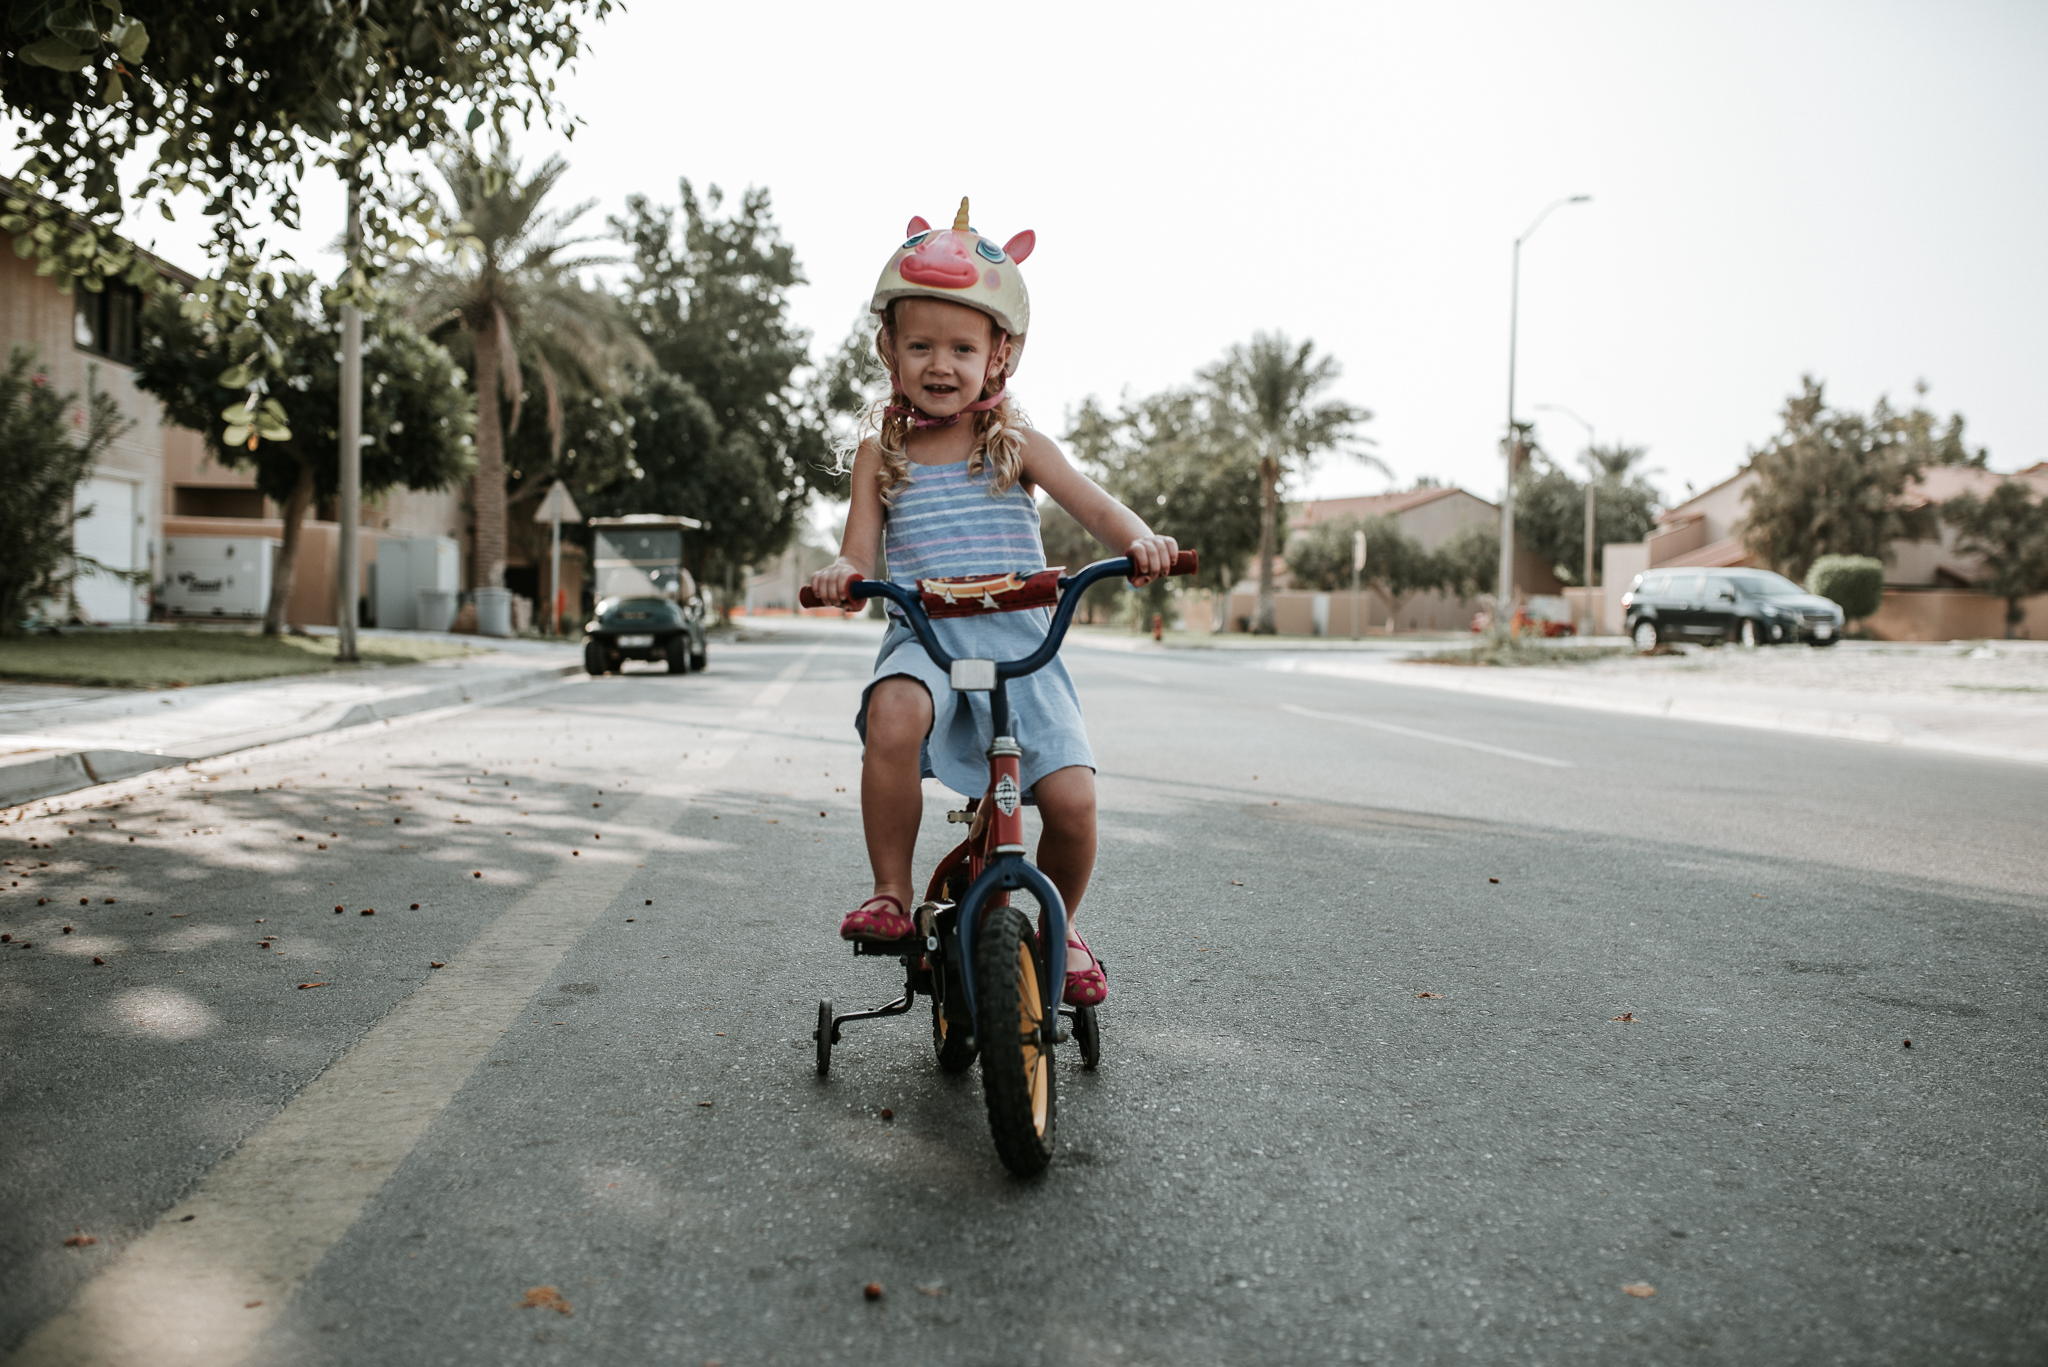 Saudi Arabia Family photographer, Houston Family photographer, Bahrain family photographer, Dhahran, Khobar family photographer , allison redmon photography, documentary photographer, family video